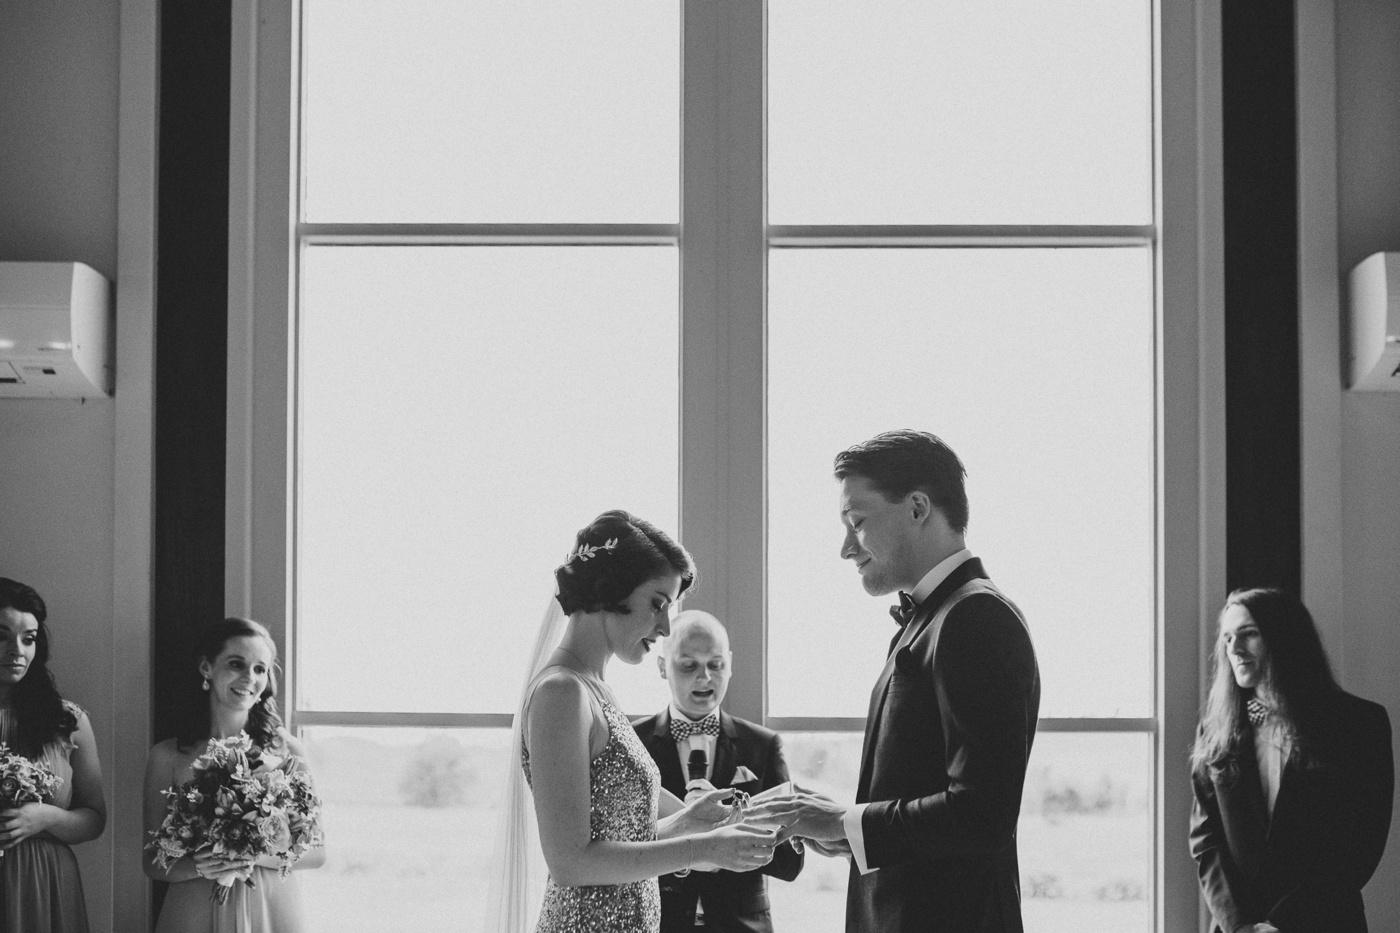 Emma&Morgan_Melbourne-Vintage-Elegant-Fun-Quirky-Yarra-Valley-Vineyard-Wedding_Melbourne-Wedding-Photography-52